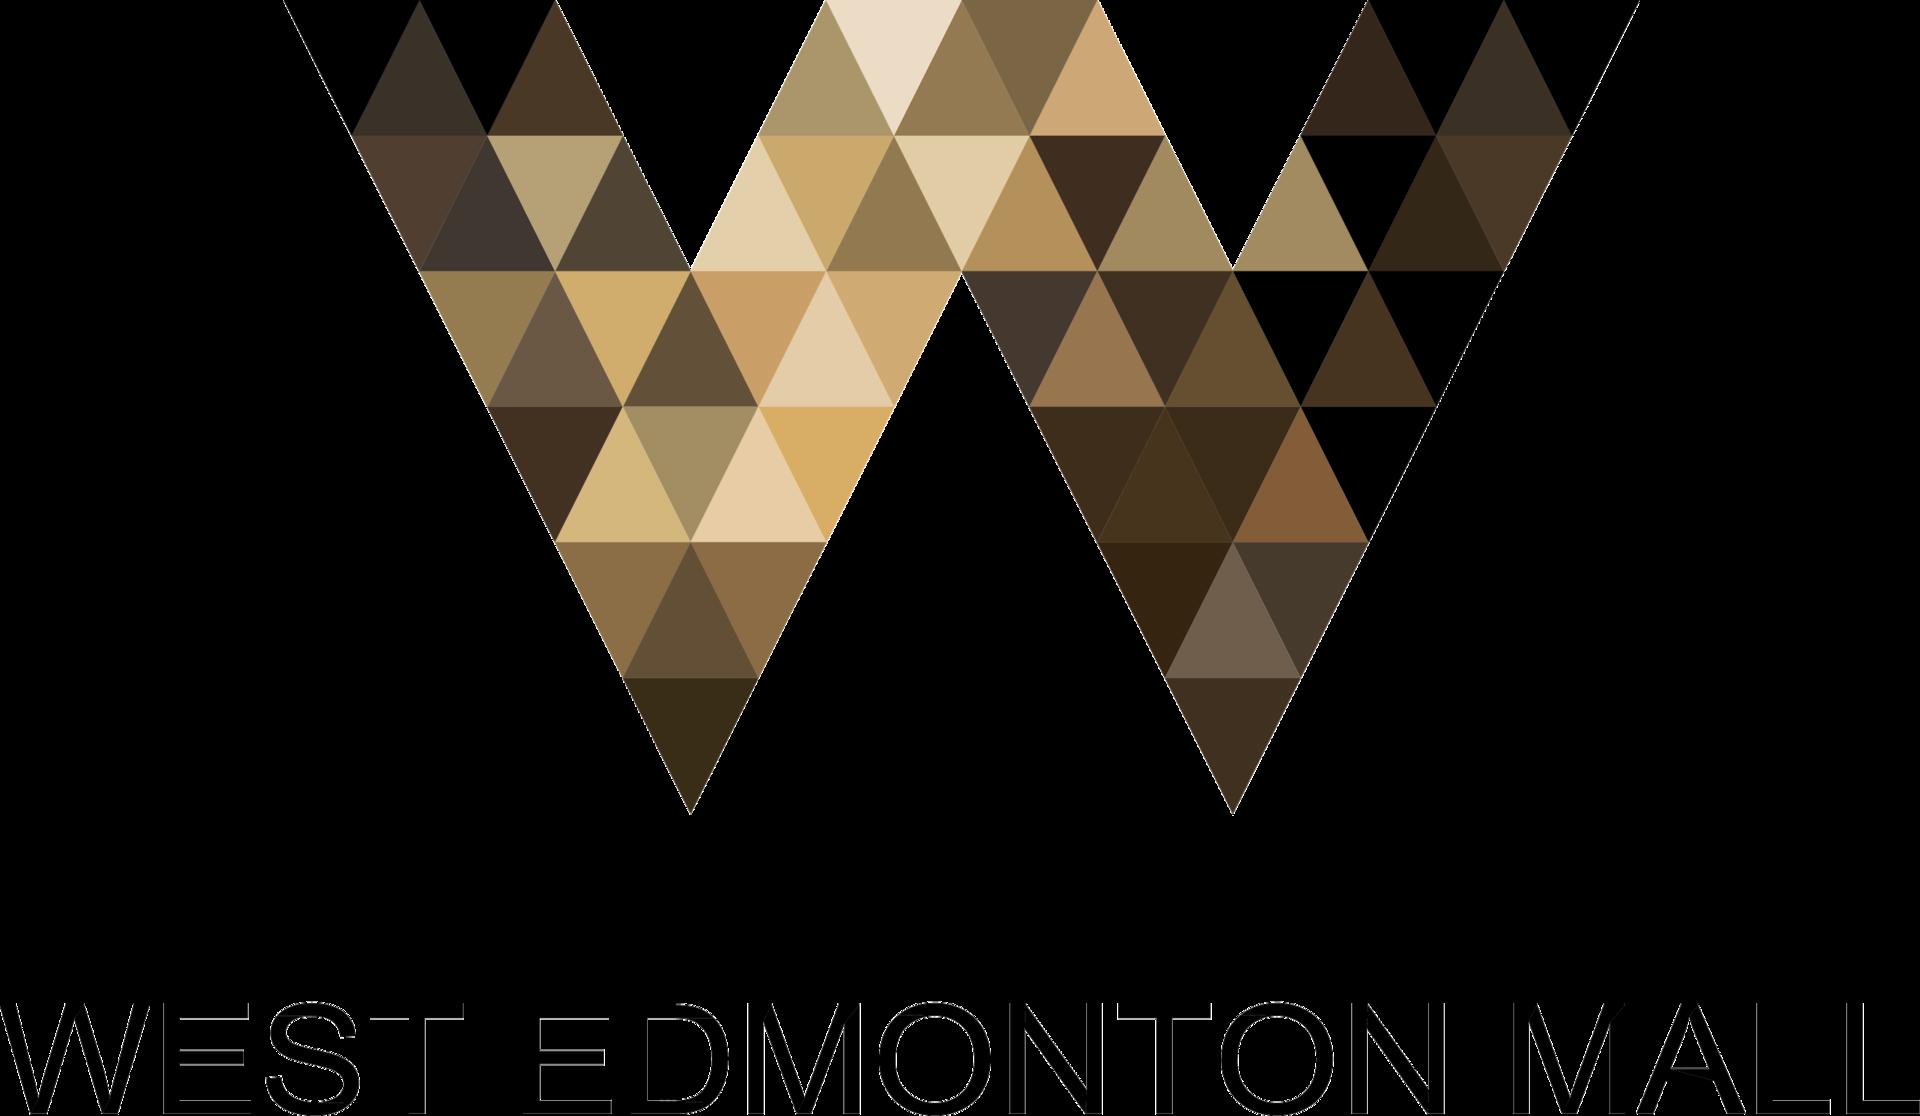 West Edmonton Mall logo